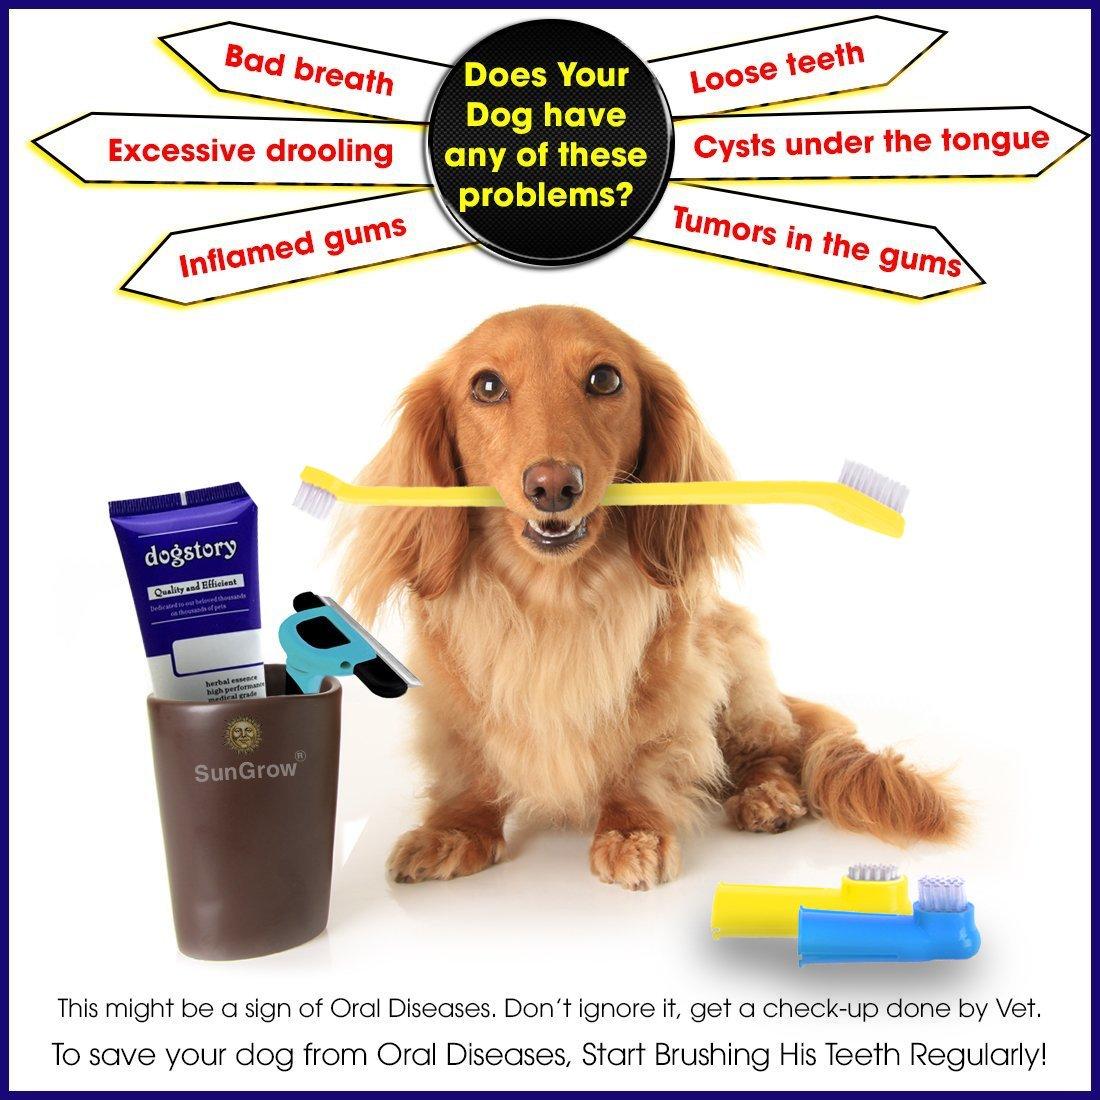 3 pcs Dog Toothbrush Set -- Dual-headed brush for better dental care - 2 Bonus Finger Brushes included - Removes plaque, freshens dog's breath - Vet & Pet Groomer Recommended - Use with Dog Toothpaste